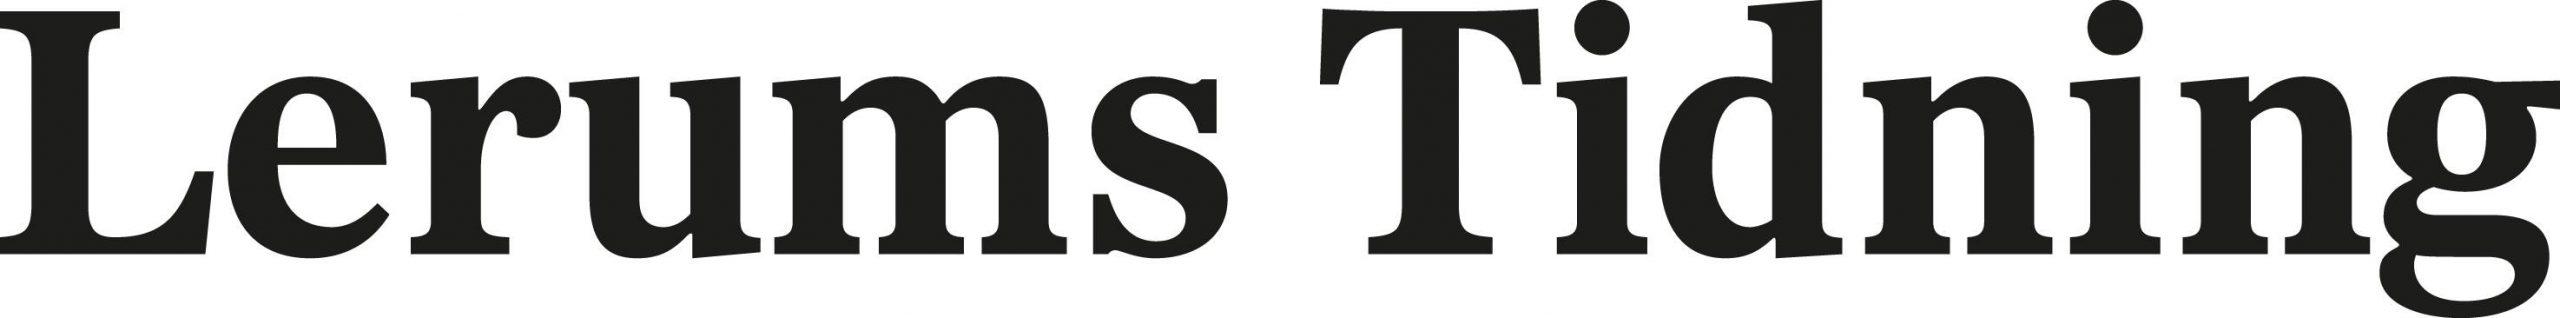 Lerums Tidning